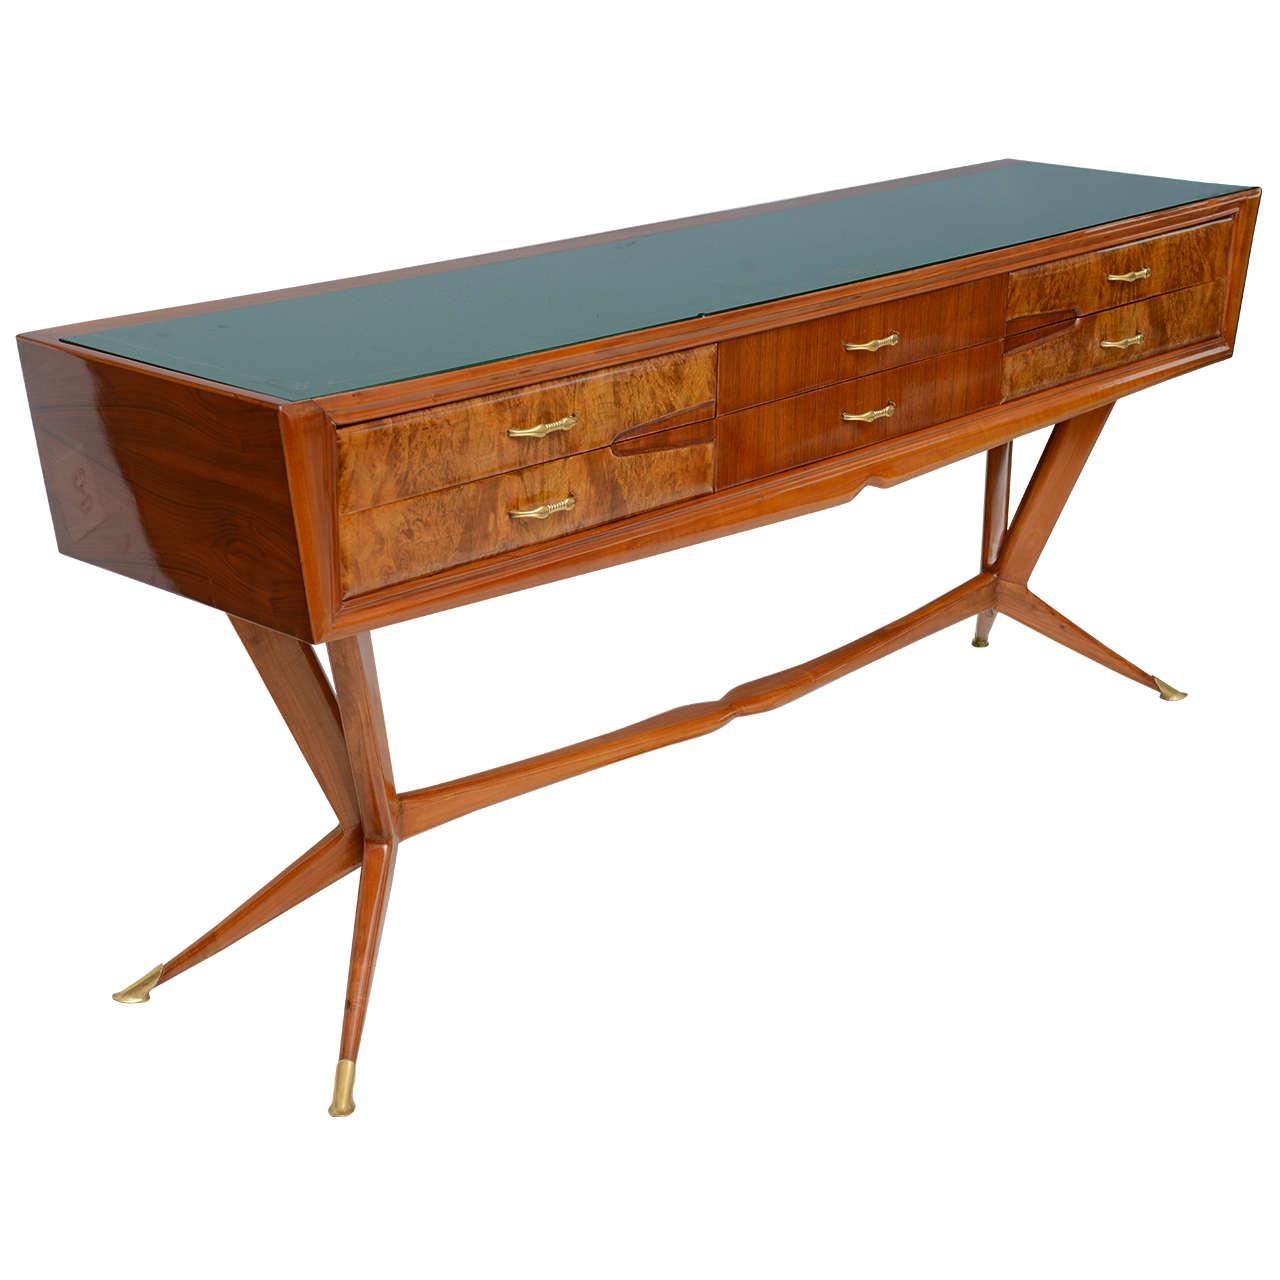 Fine Italian Modern Mahogany Walnut and Rootwood Buffet/Console, Melchiorre Bega